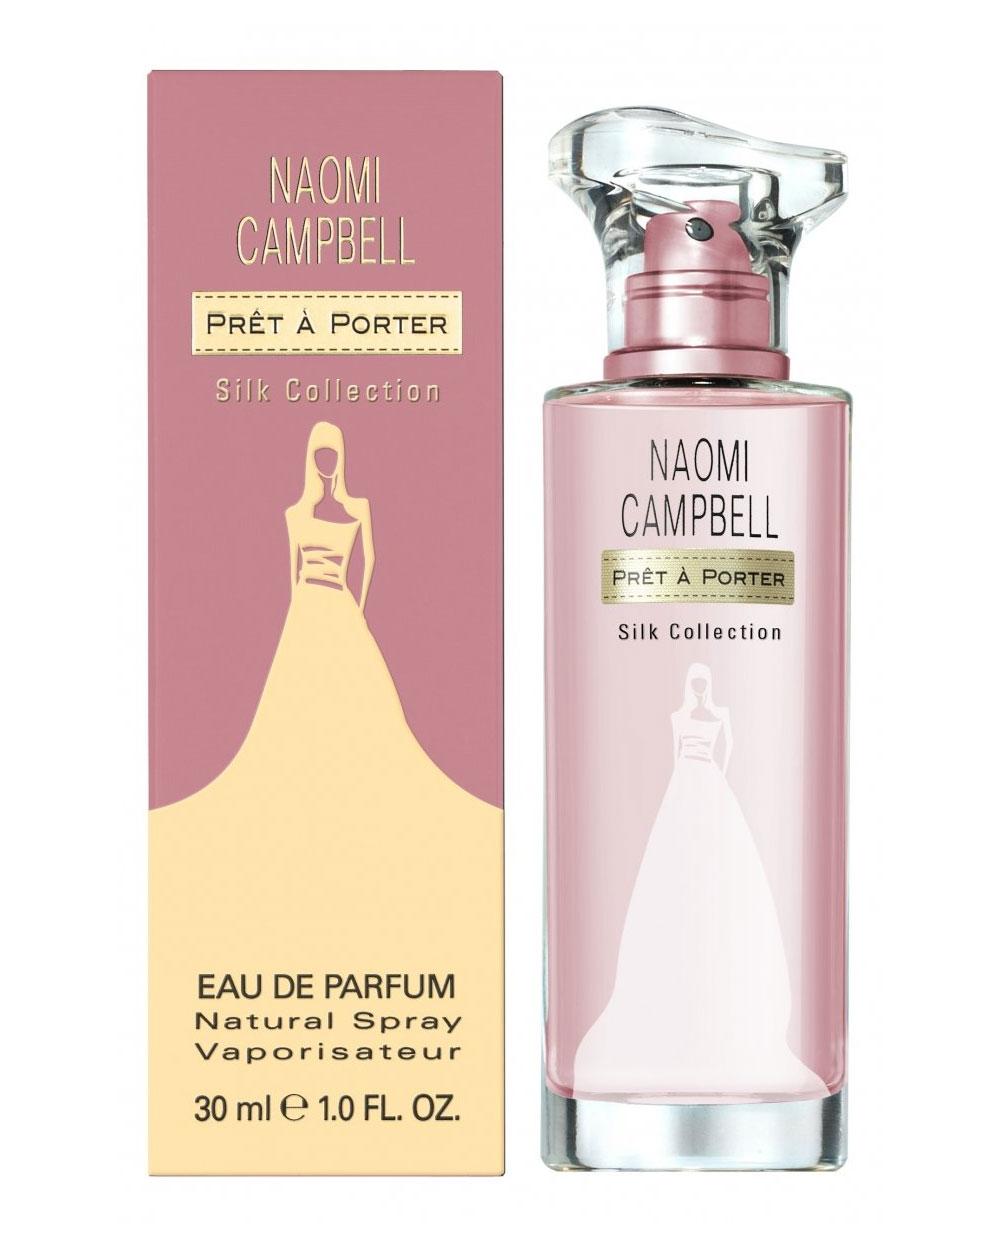 Pr t porter silk collection naomi campbell perfume a for Pret a porter